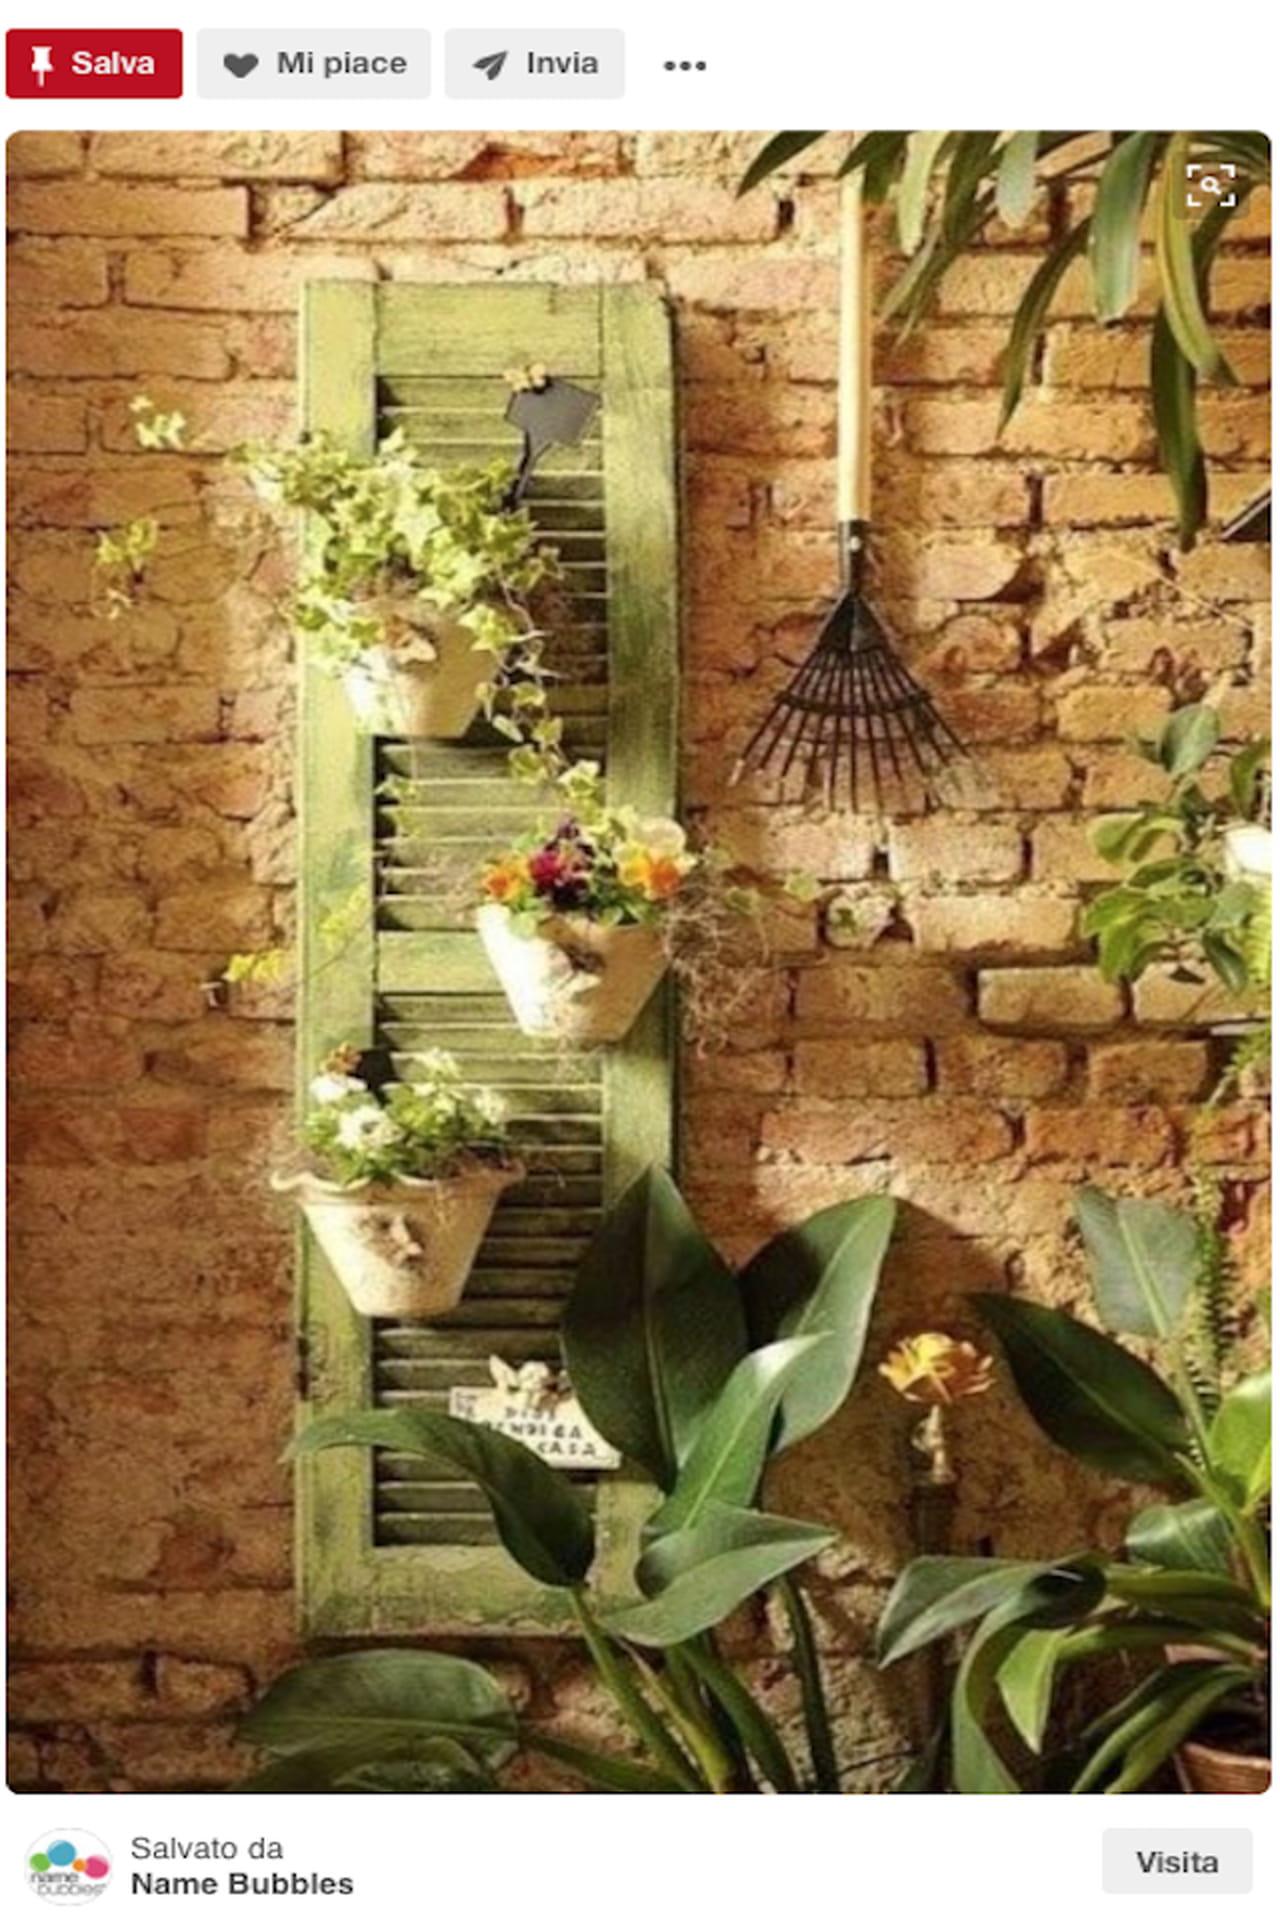 Creazioni fai da te idee giardino da pinterest - Vialetto giardino fai da te ...